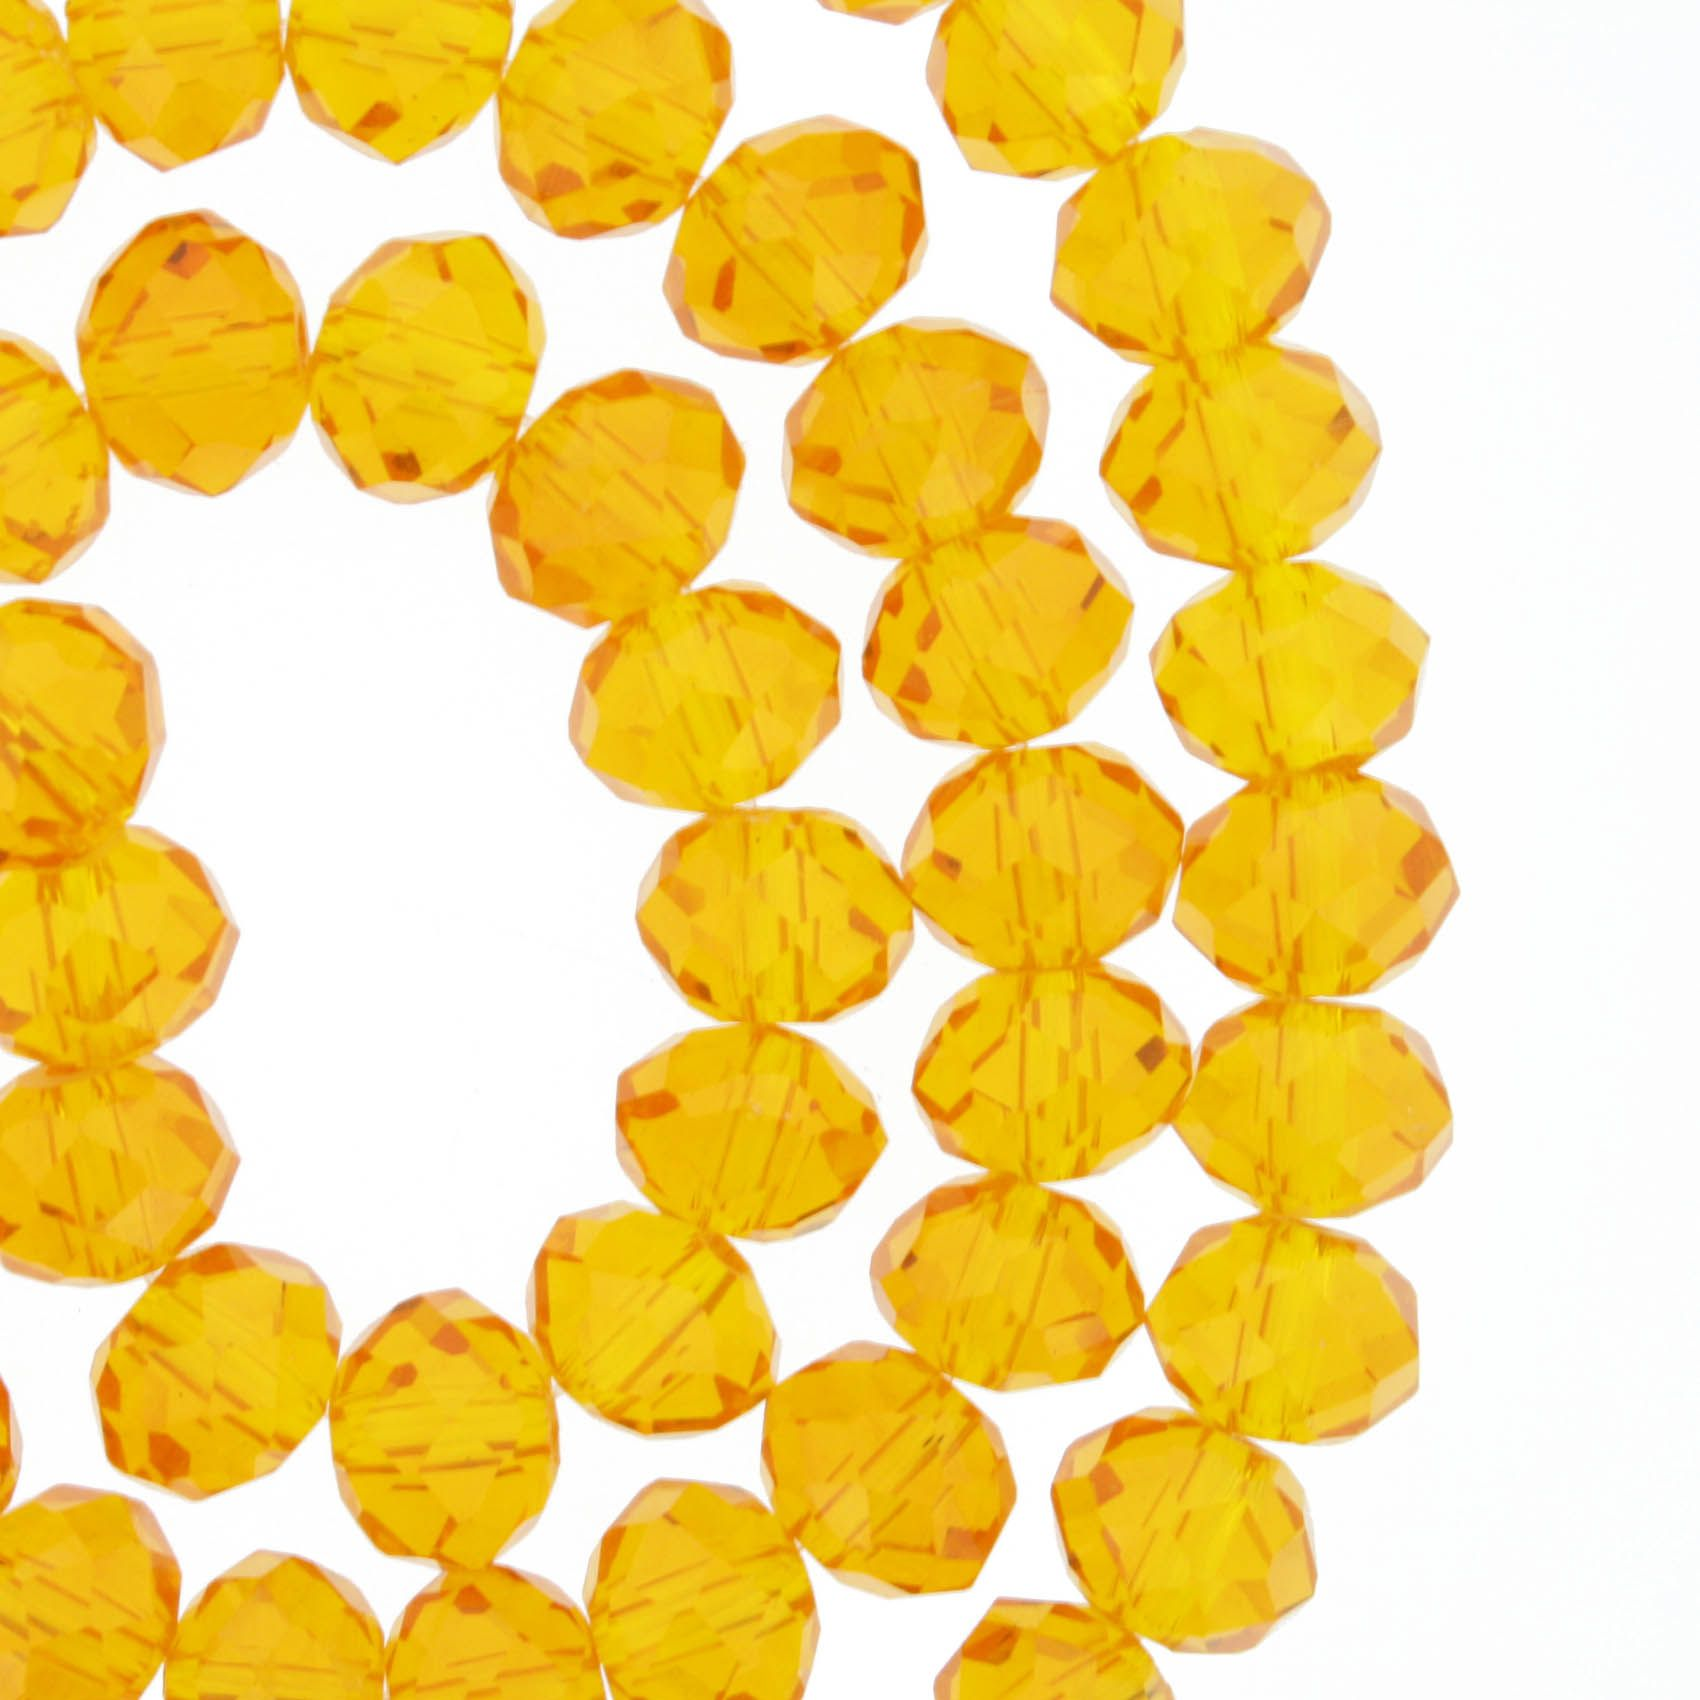 Fio de Cristal - Flat® - Laranja Transparente - 8mm  - Stéphanie Bijoux® - Peças para Bijuterias e Artesanato